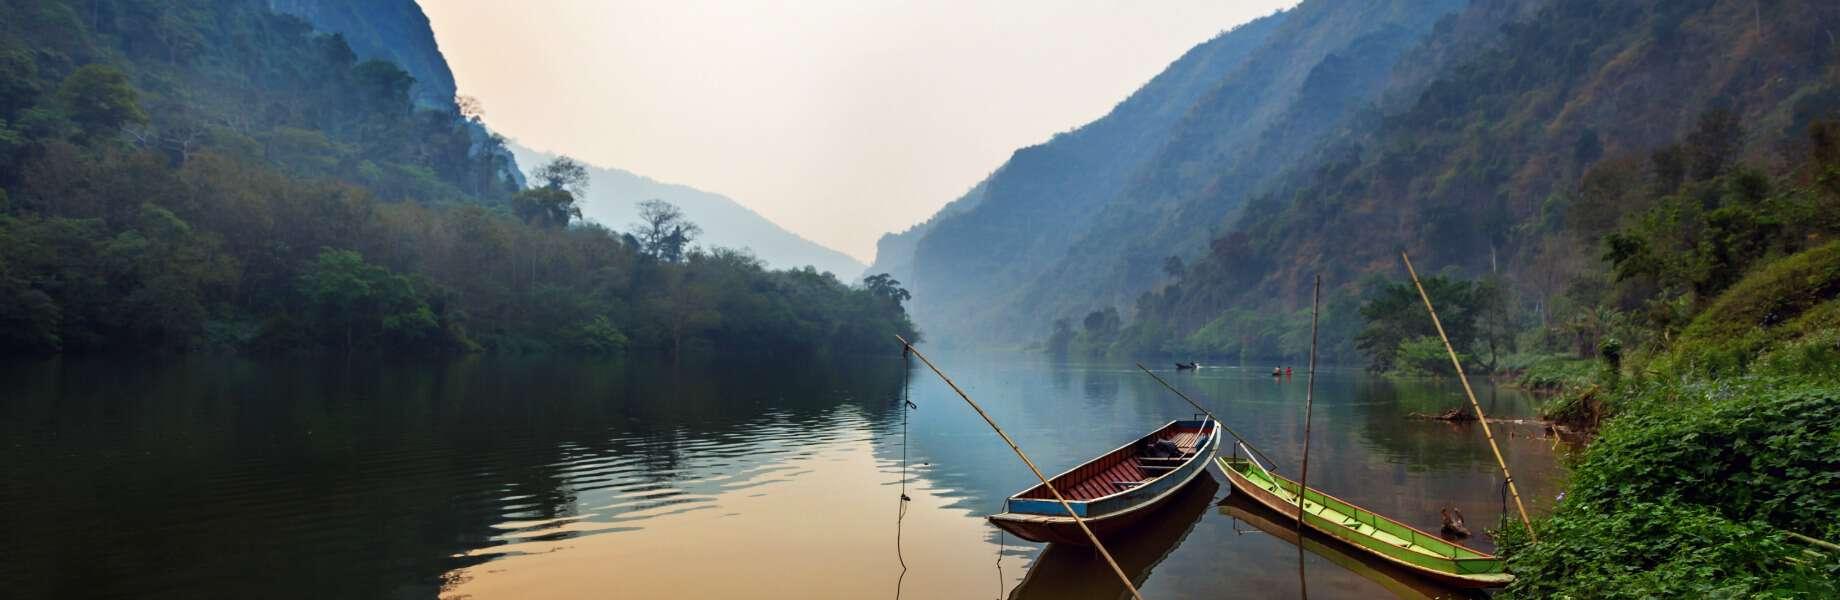 Discover Southeast Asia - Laos